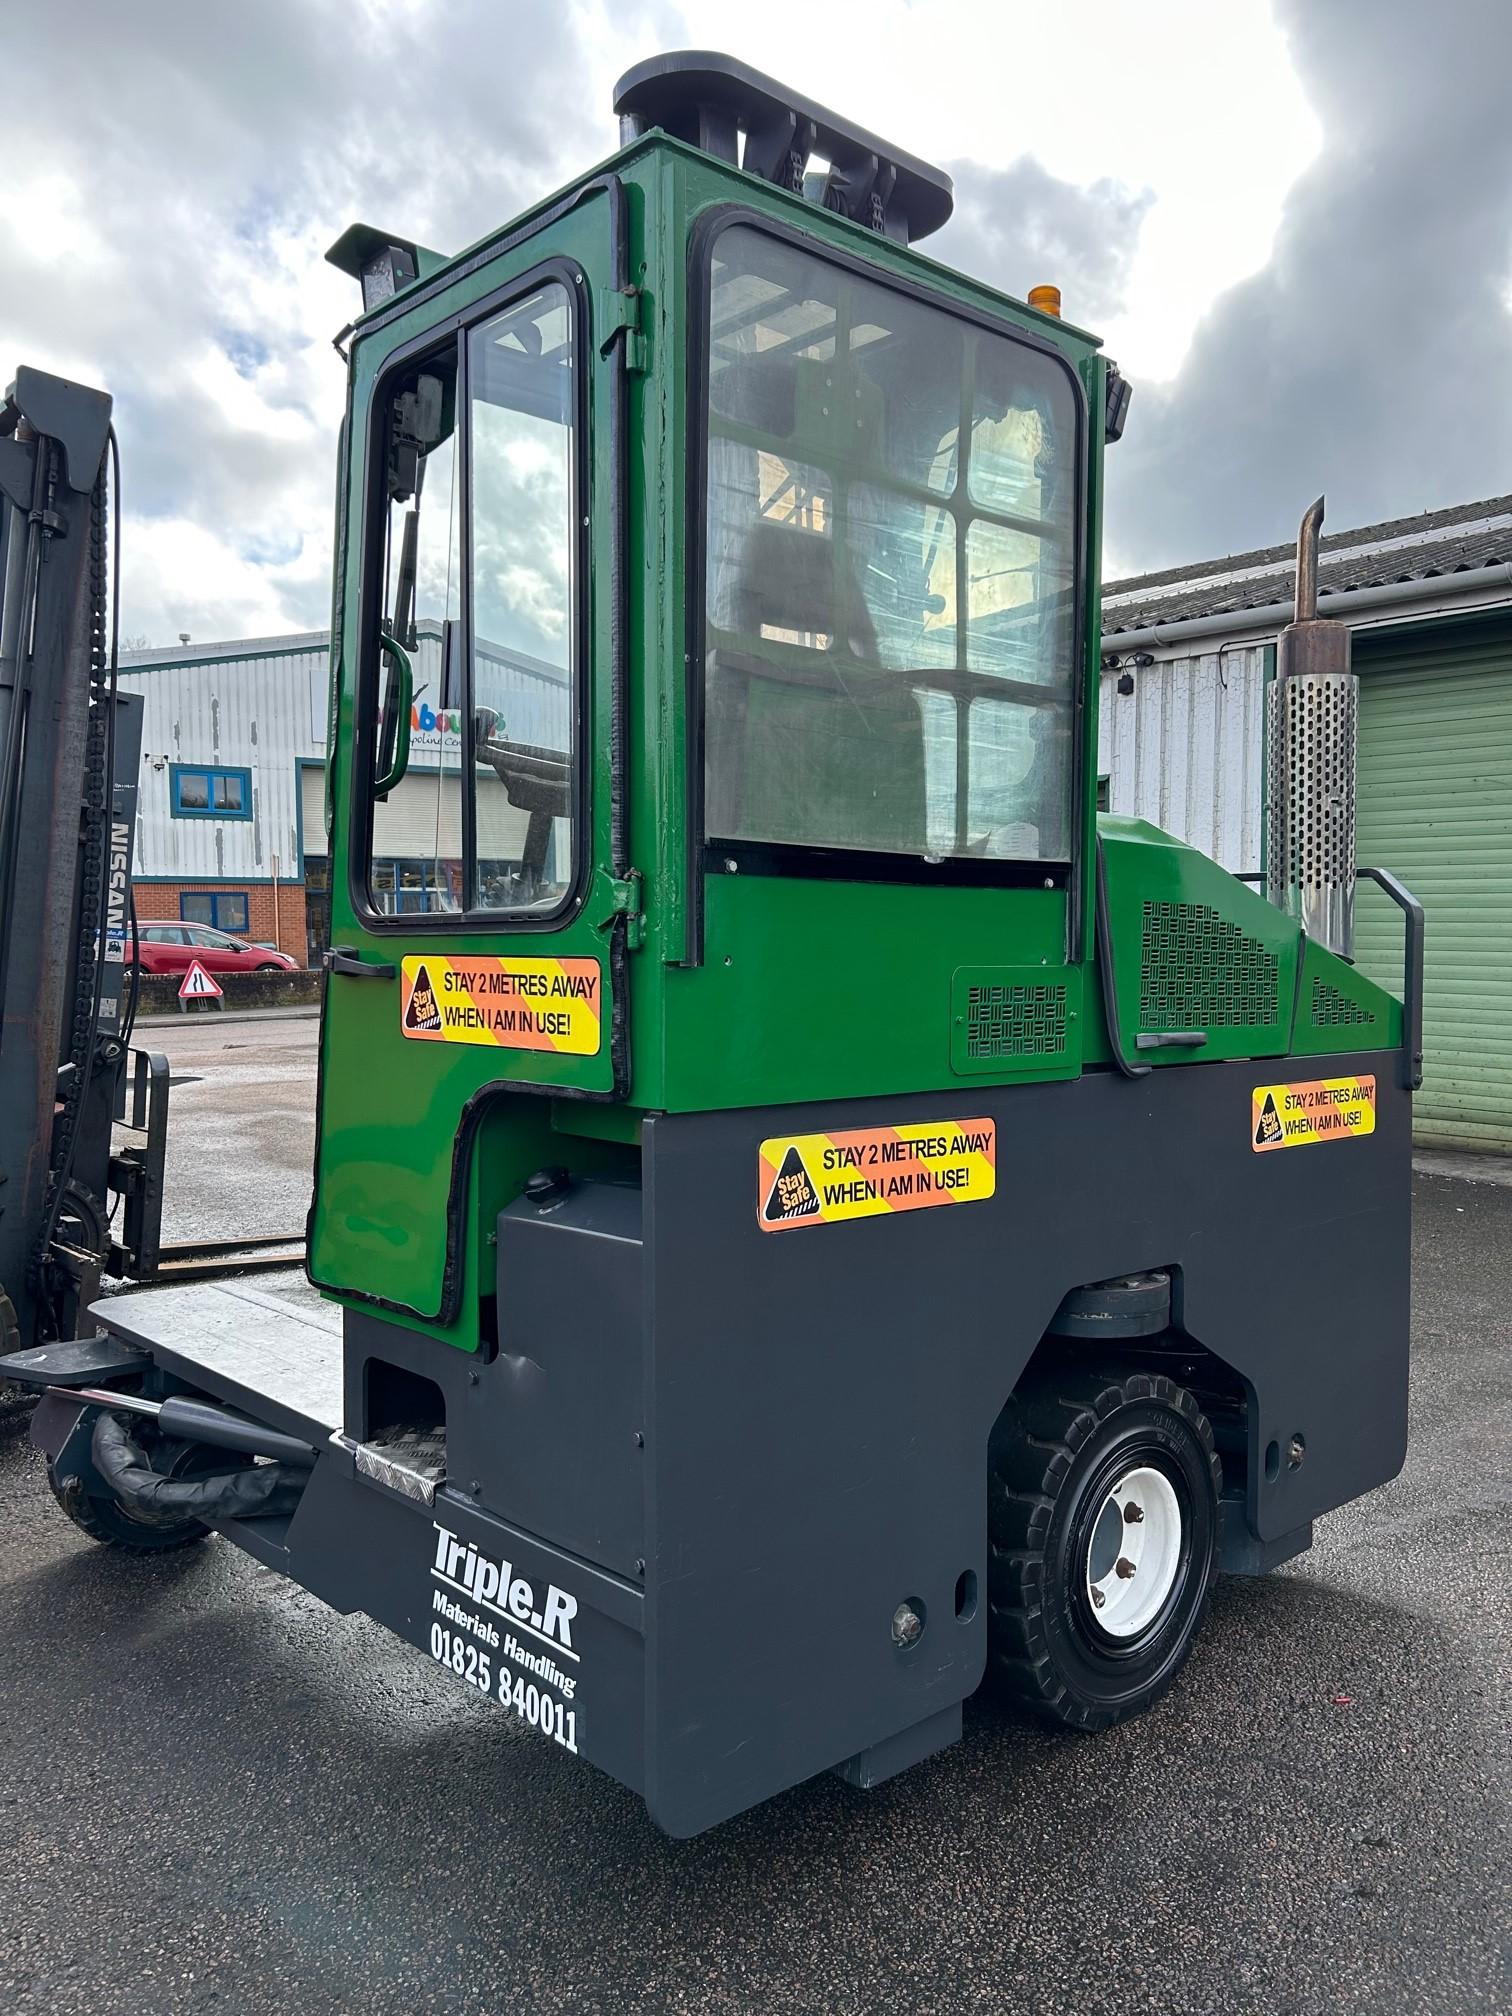 Doosan D25S-5 Diesel Forklift